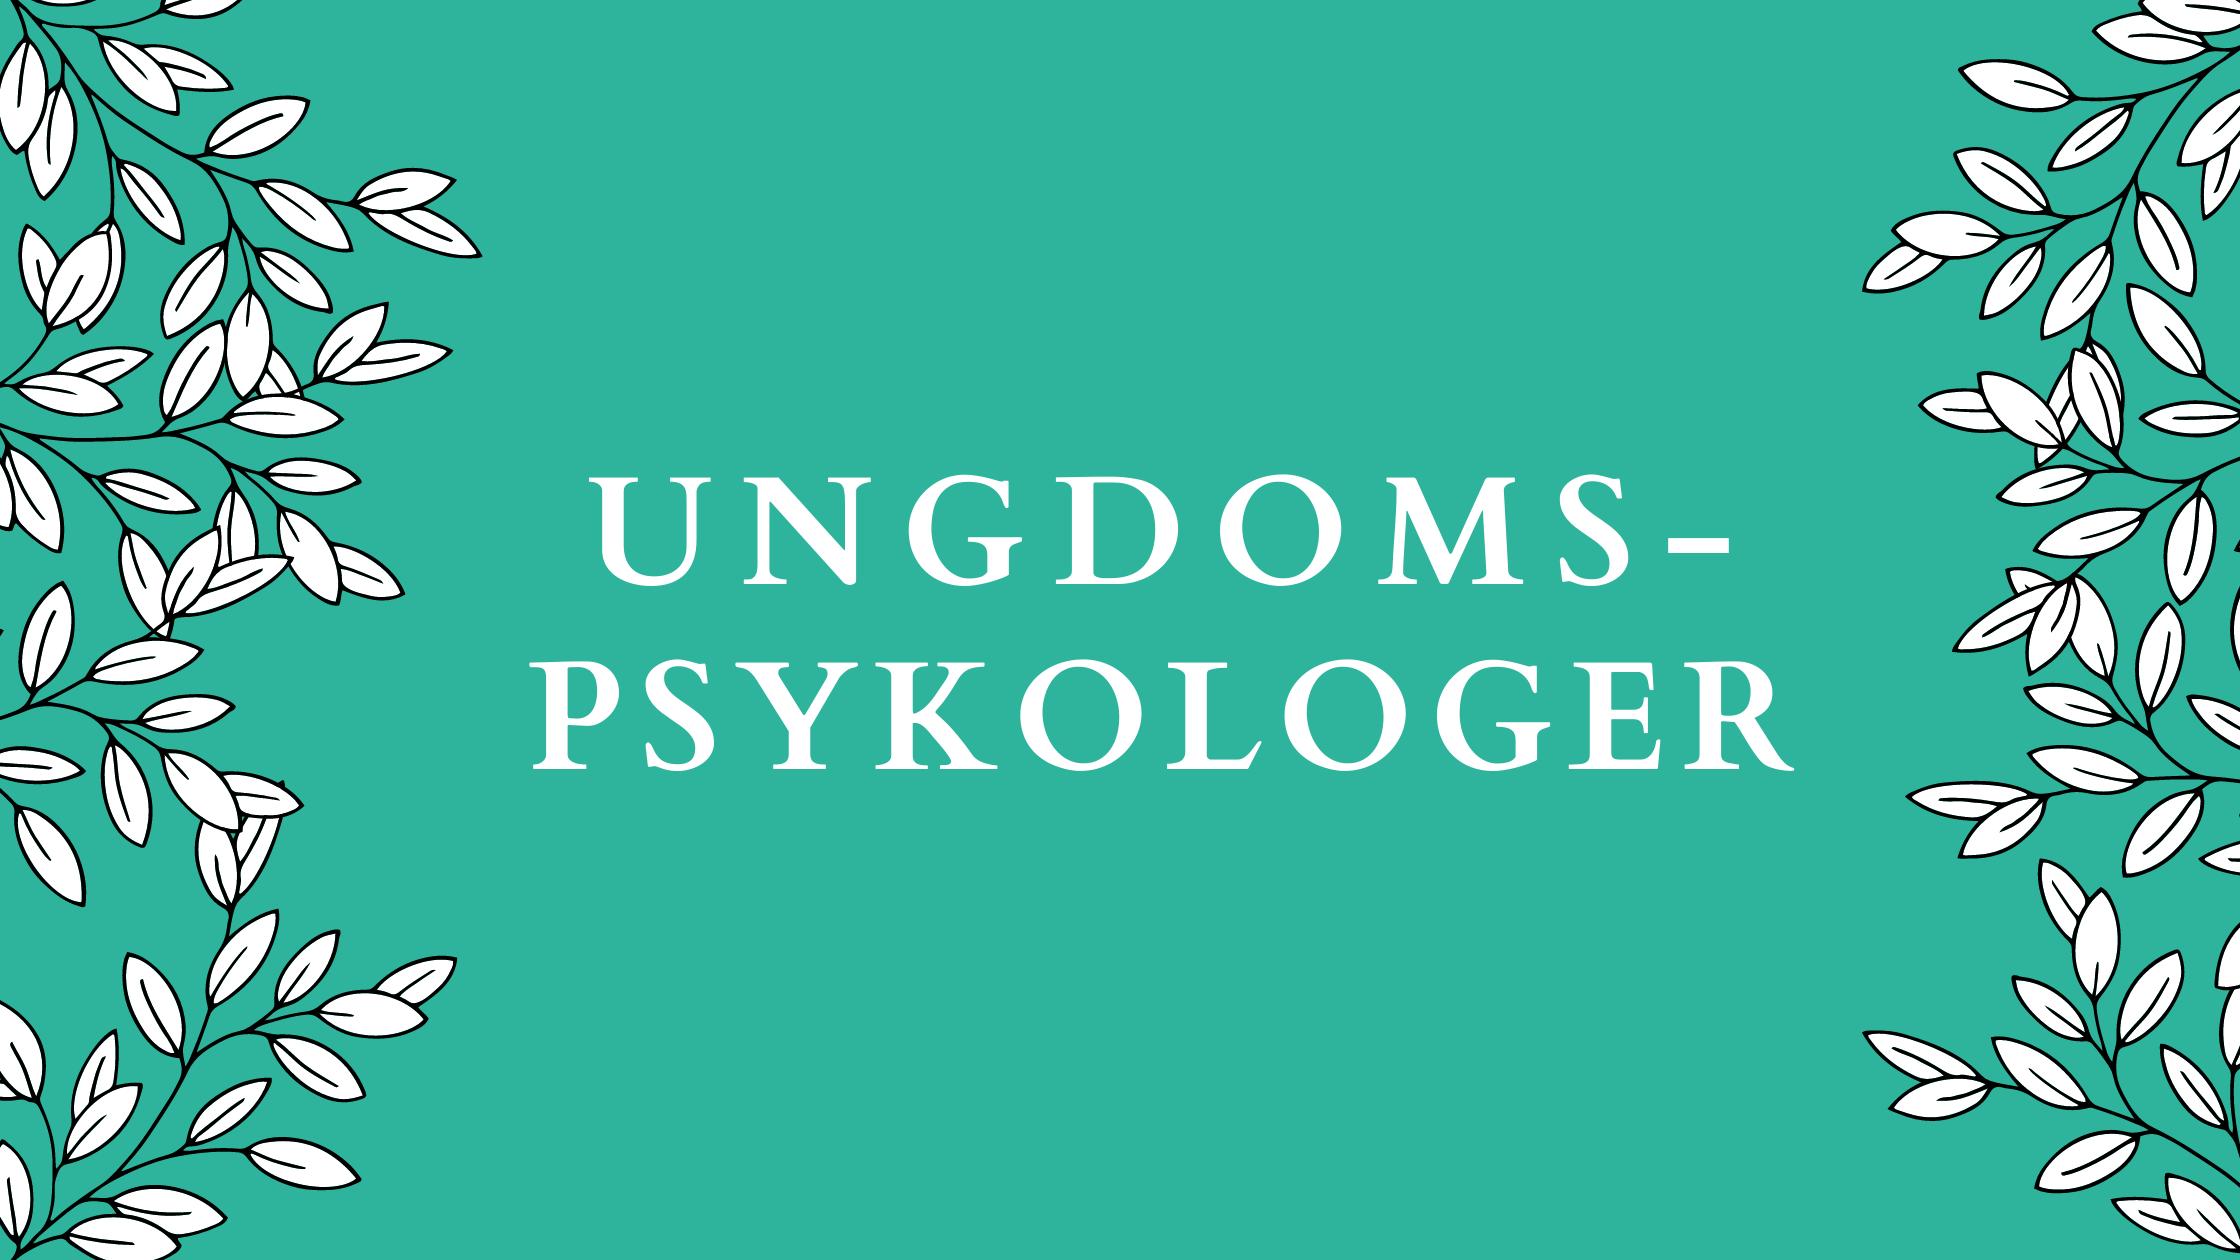 Ungdomspsykologer i Danmark